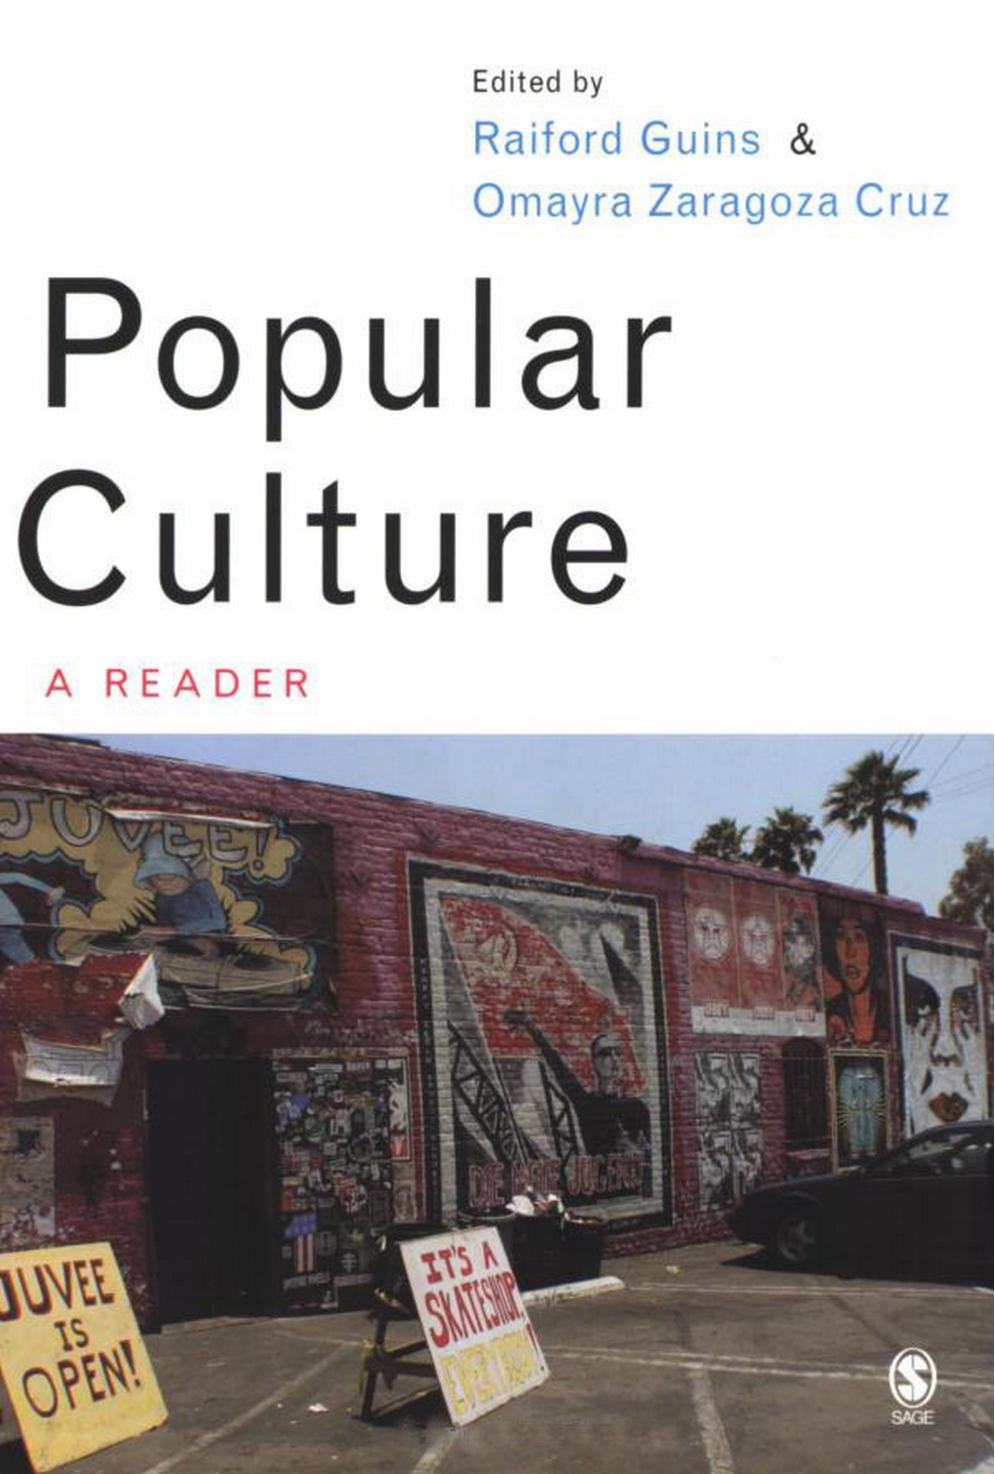 Popular Culture  A Reader - sikkim university library 40806e1231d